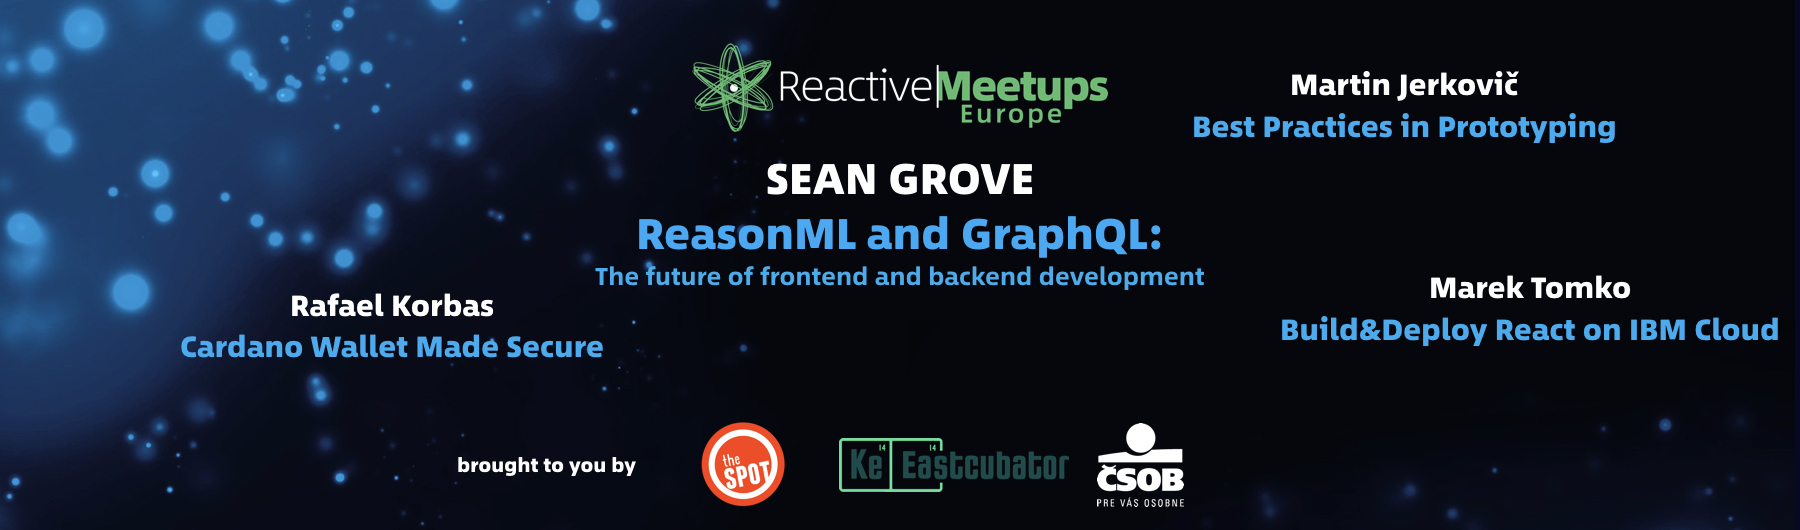 ReactiveMeetups Košice | Sean Grove